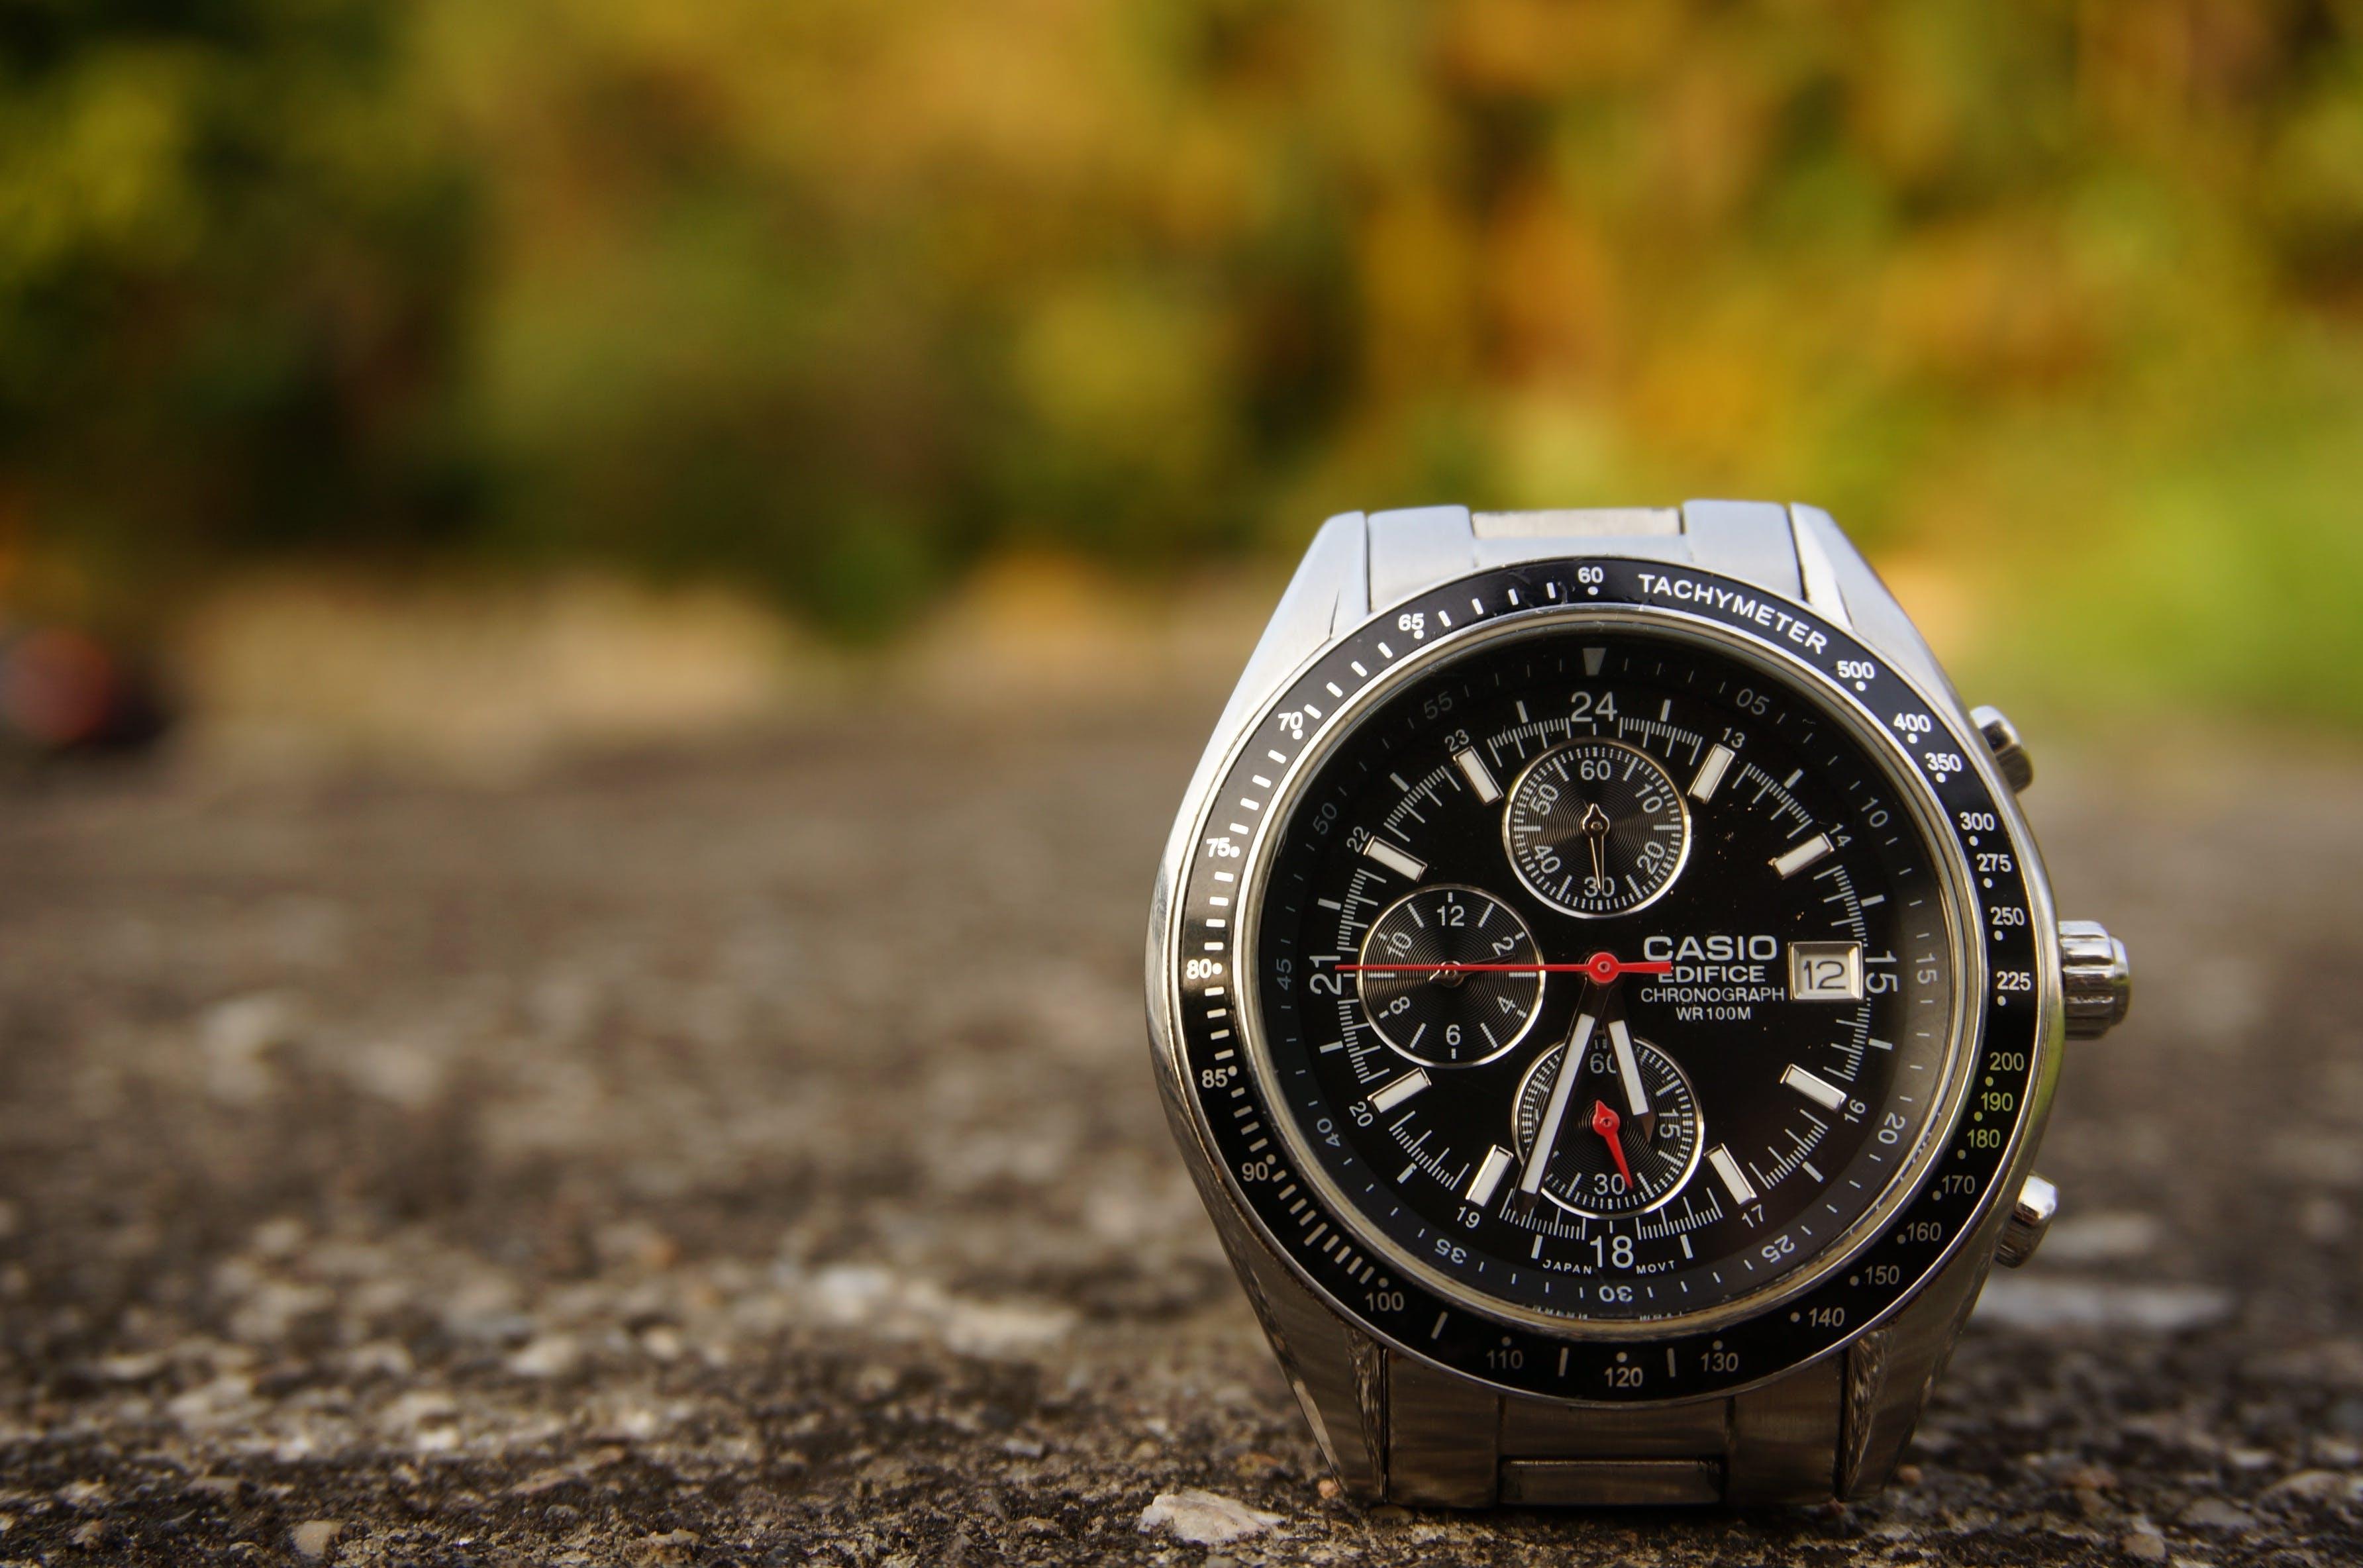 Free stock photo of wristwatch, ground, time, watch